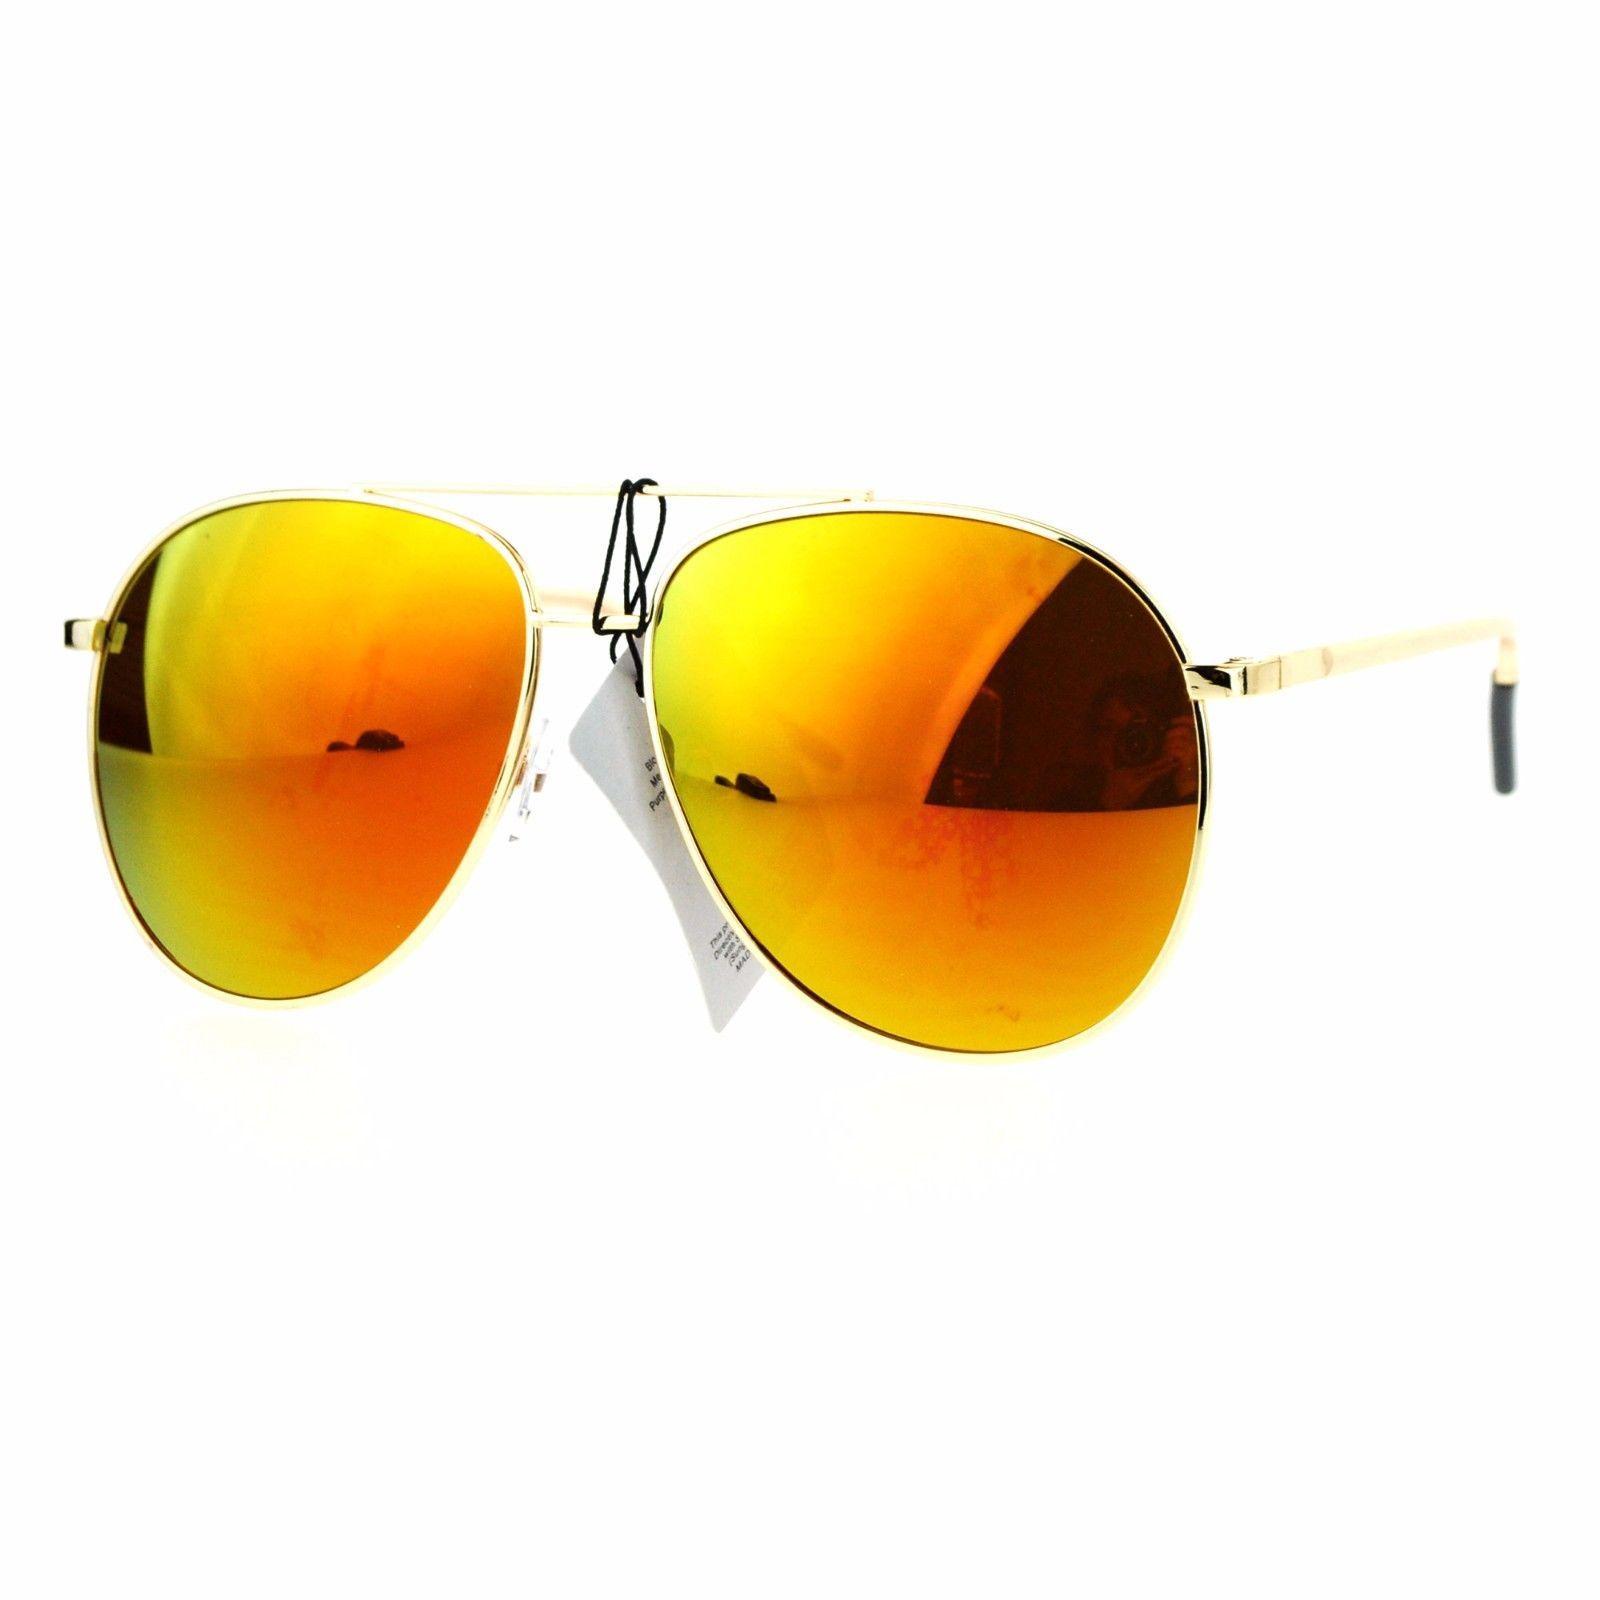 Fashion Aviator Sunglasses Vintage Driver Aviators Metal Frame UV 400